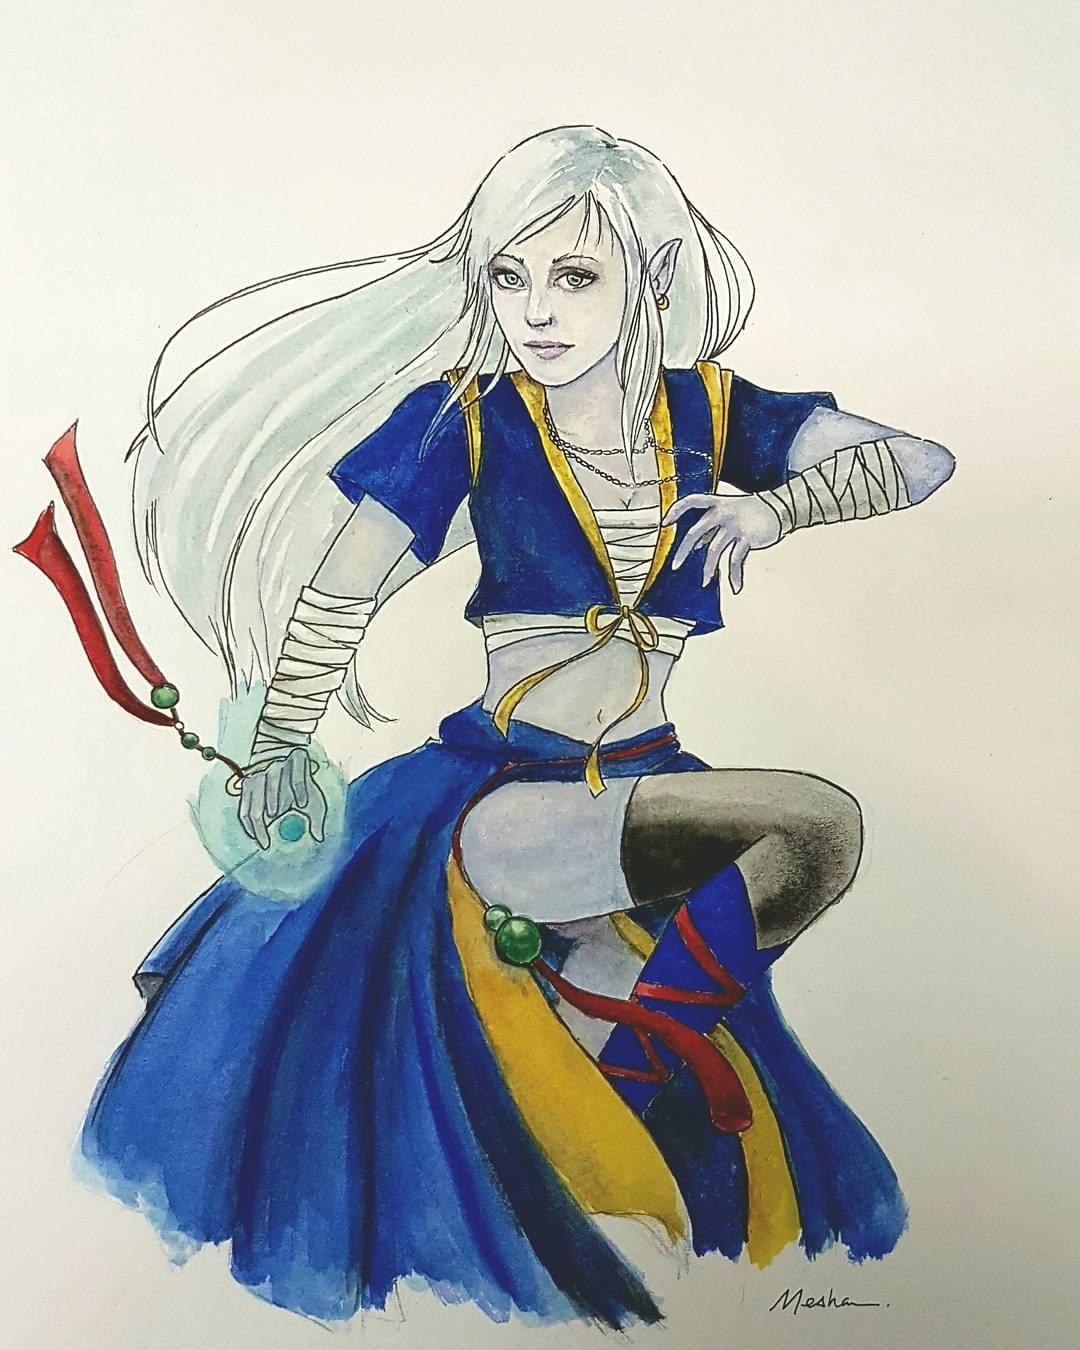 D&D: Moon Elf Monk